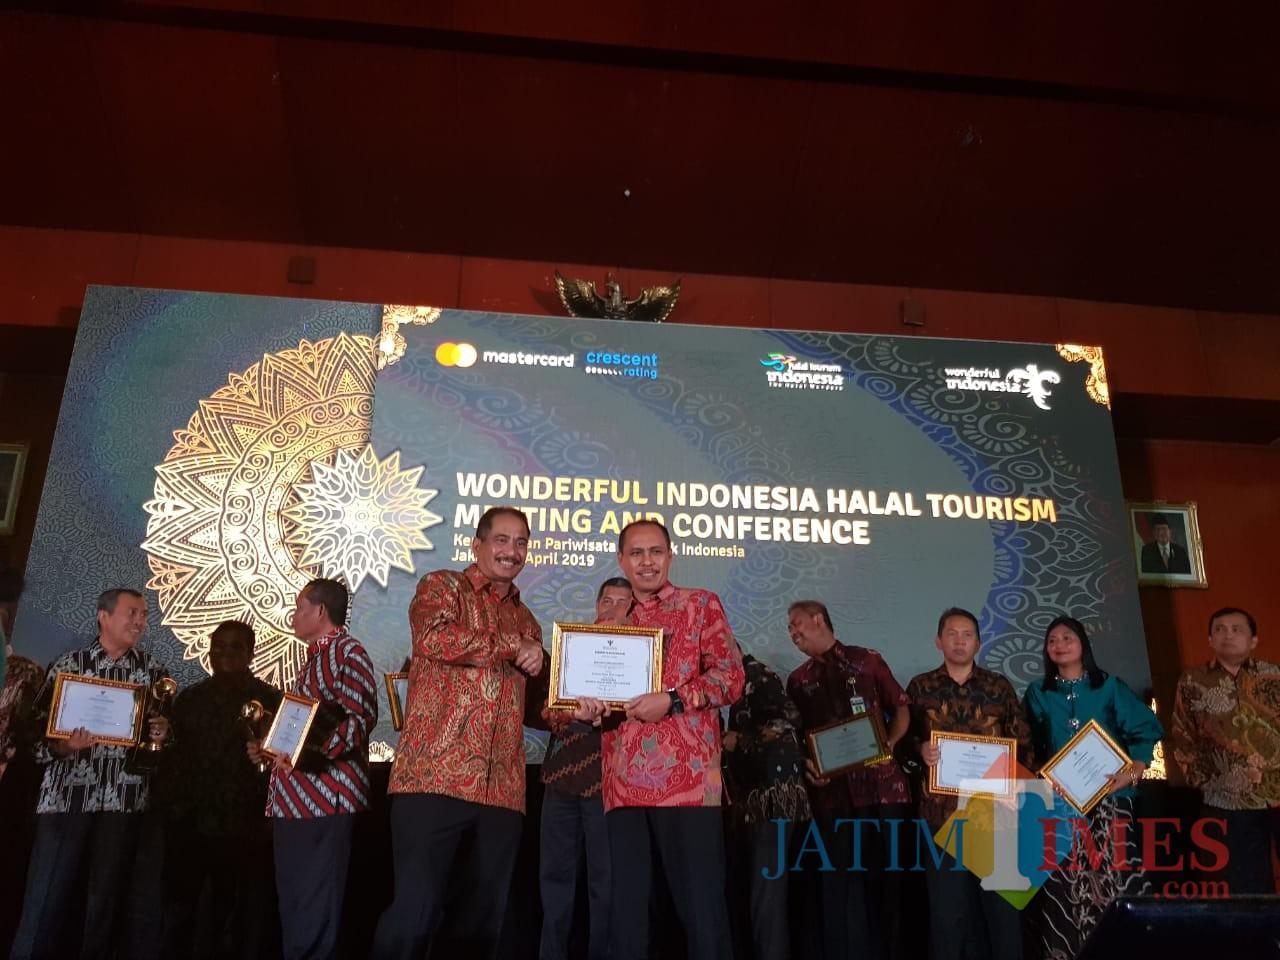 Plt Kadisparta Kota Batu Imam Suryono ketika menerima piagam penghargaan di Hotel Bidakara Jakarta. (foto istimewa)